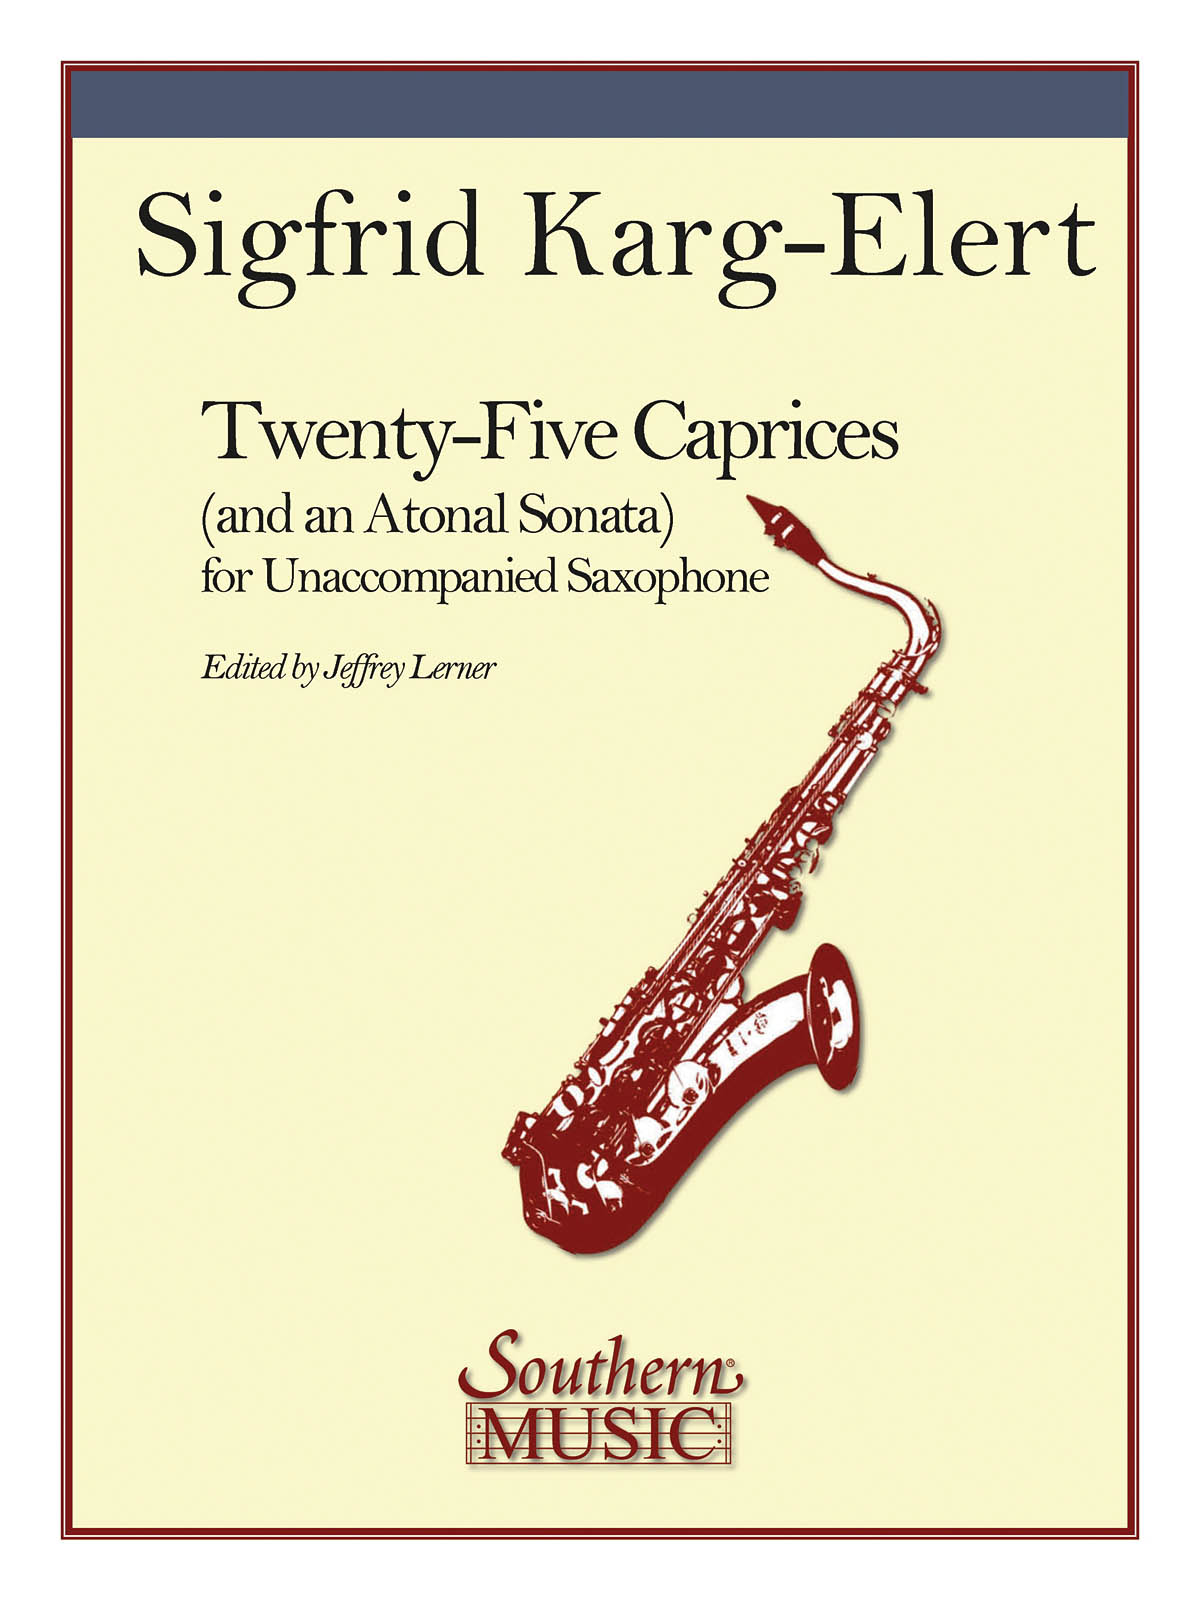 Sigfrid Karg-Elert: 25 Caprices and an Atonal Sonata: Saxophone: Instrumental